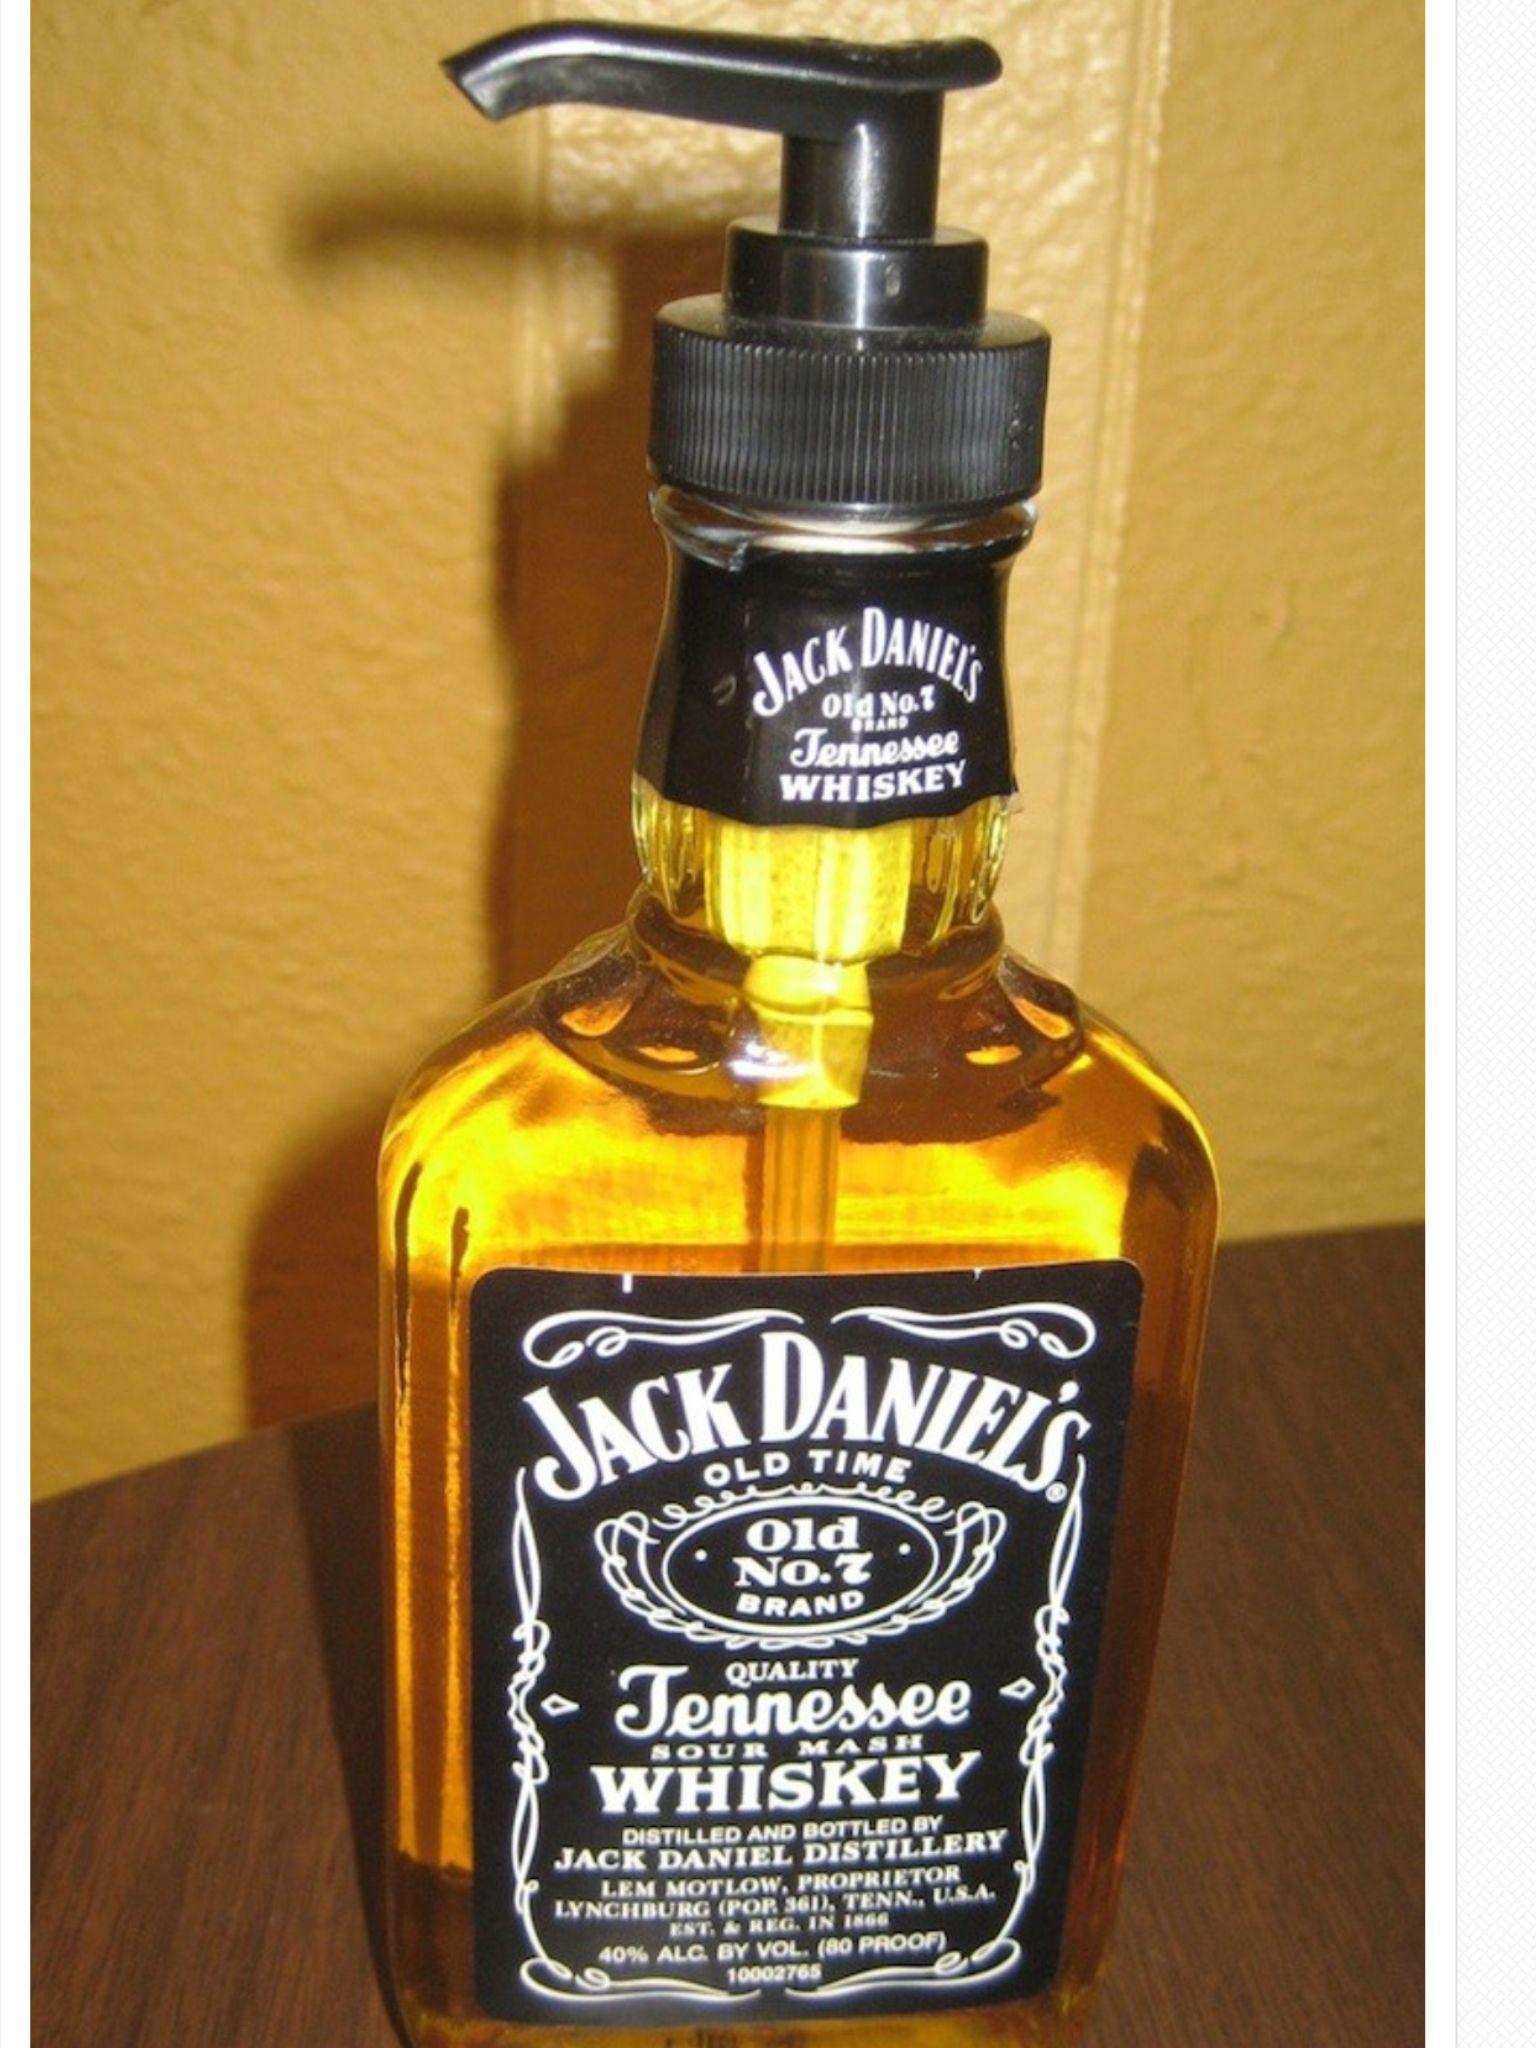 Gel de mãos garrafa de wisky | Diseño | Pinterest | Jack daniels ...